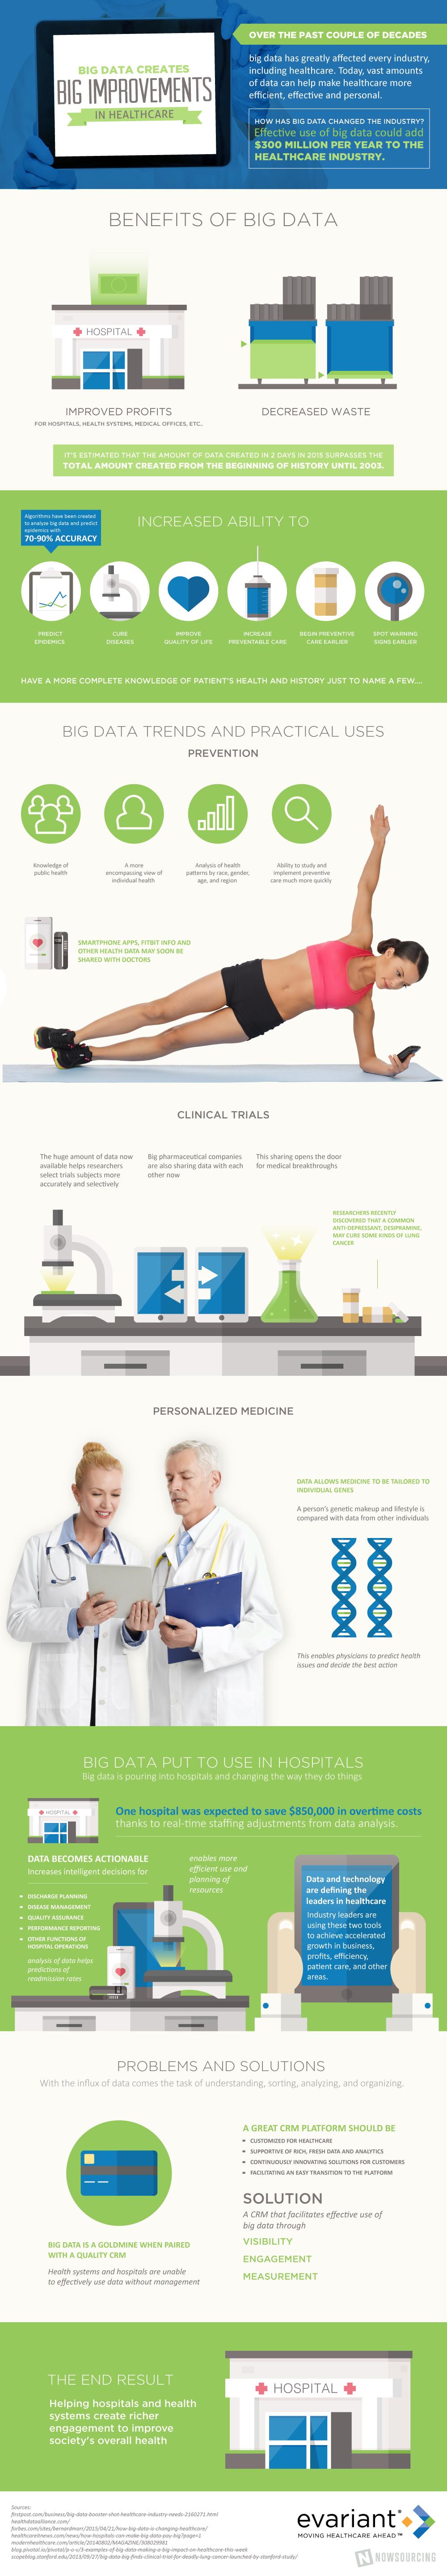 Big Data Creates Big Improvements In Healthcare